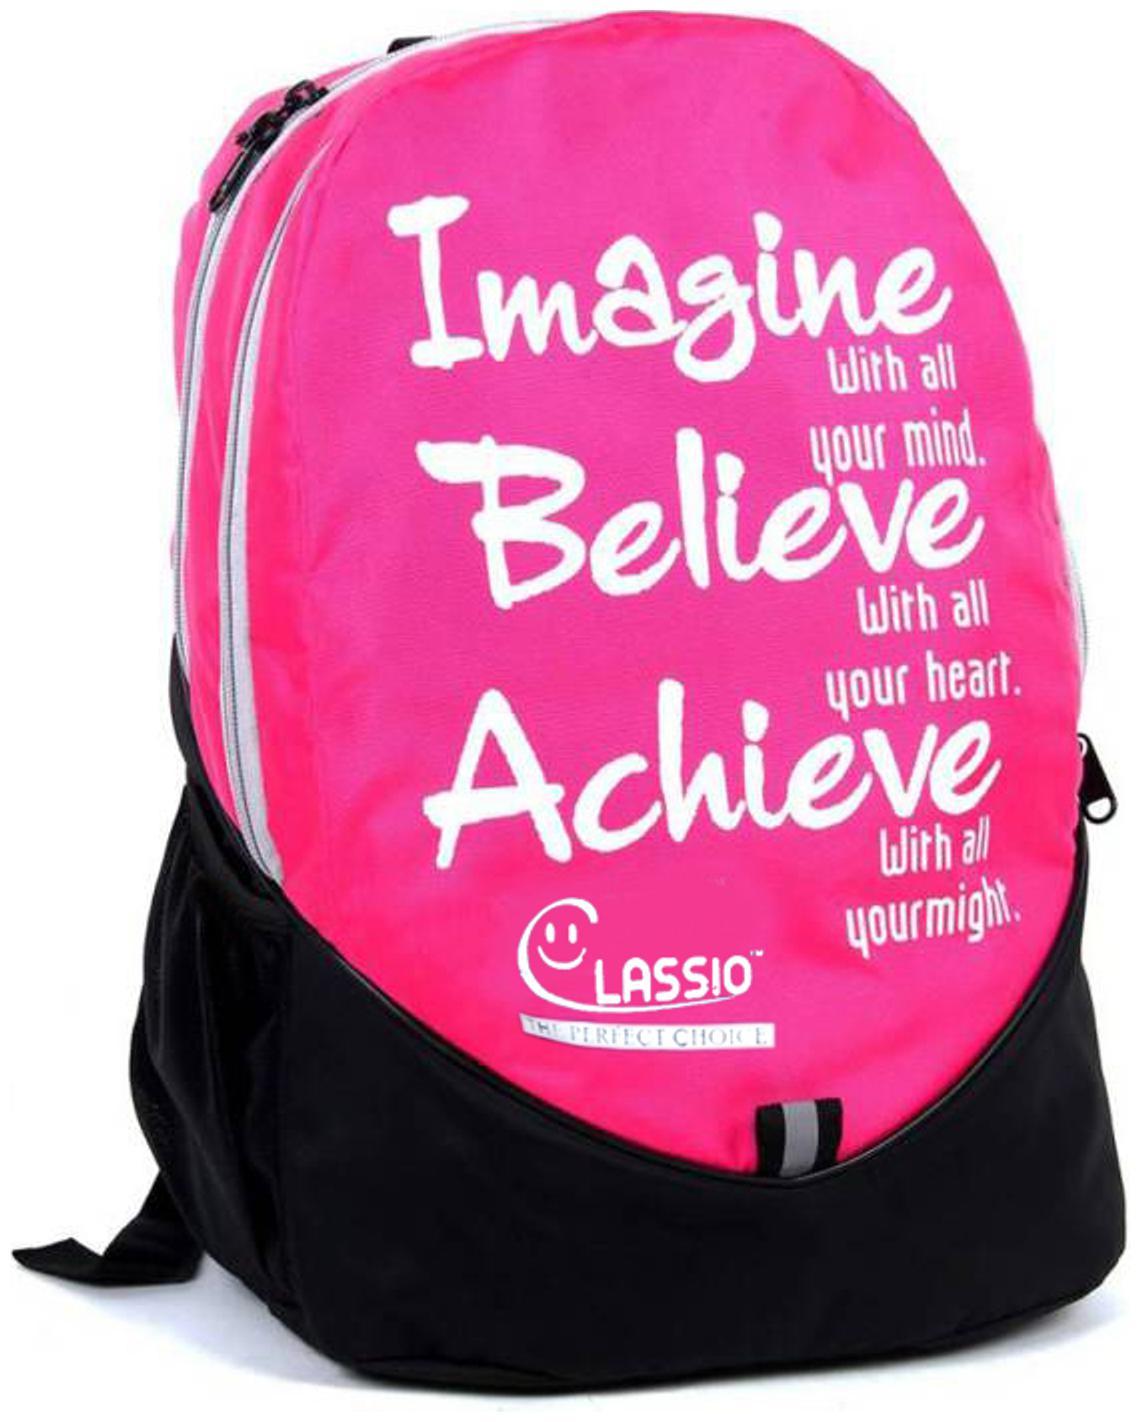 CLASSIO 35 School bag   Pink   Black